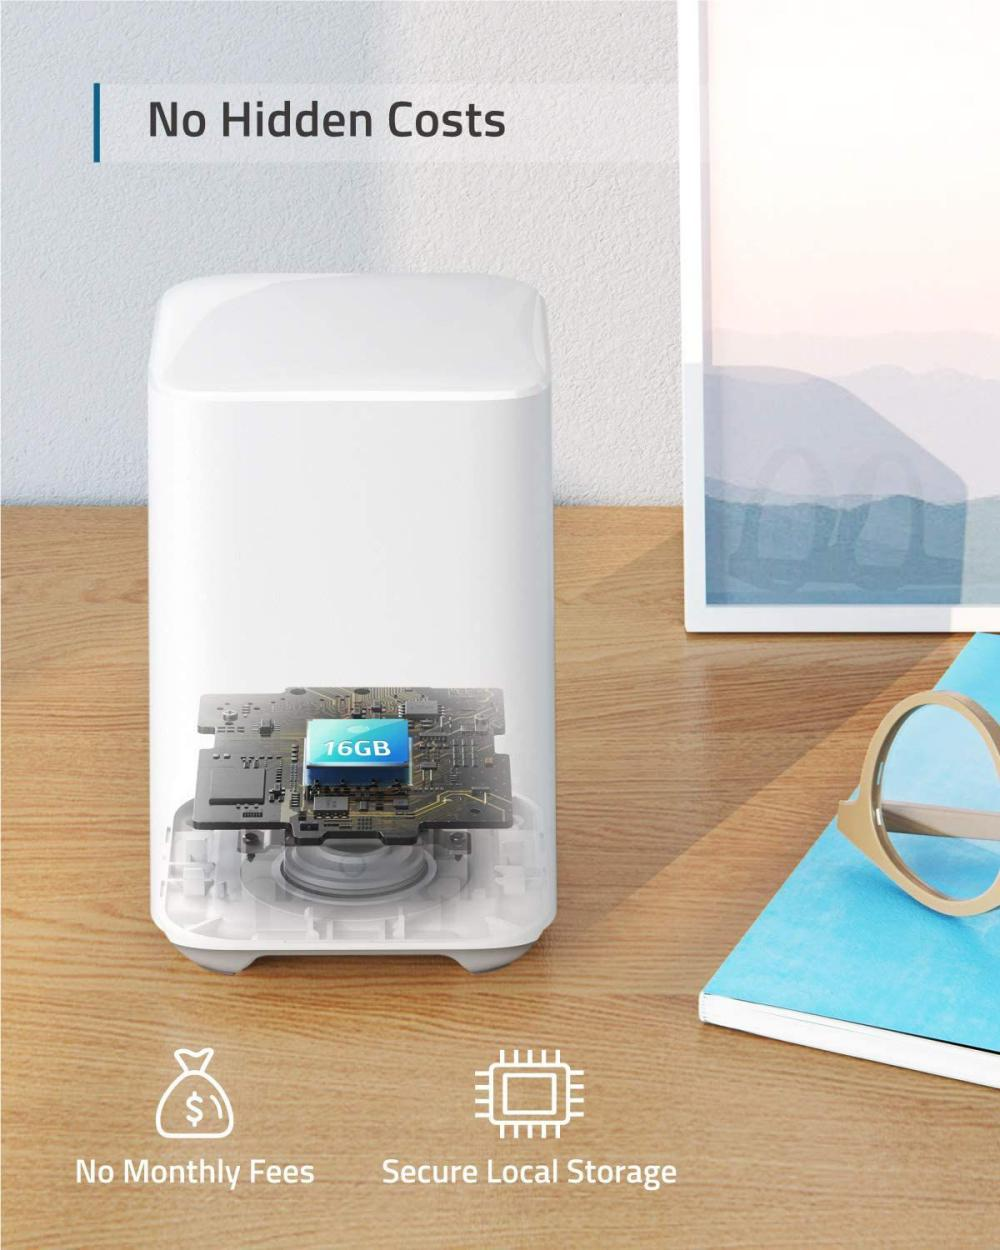 Eufy Eufycam 2c Wireless Home Security Camera System 1080p (3)